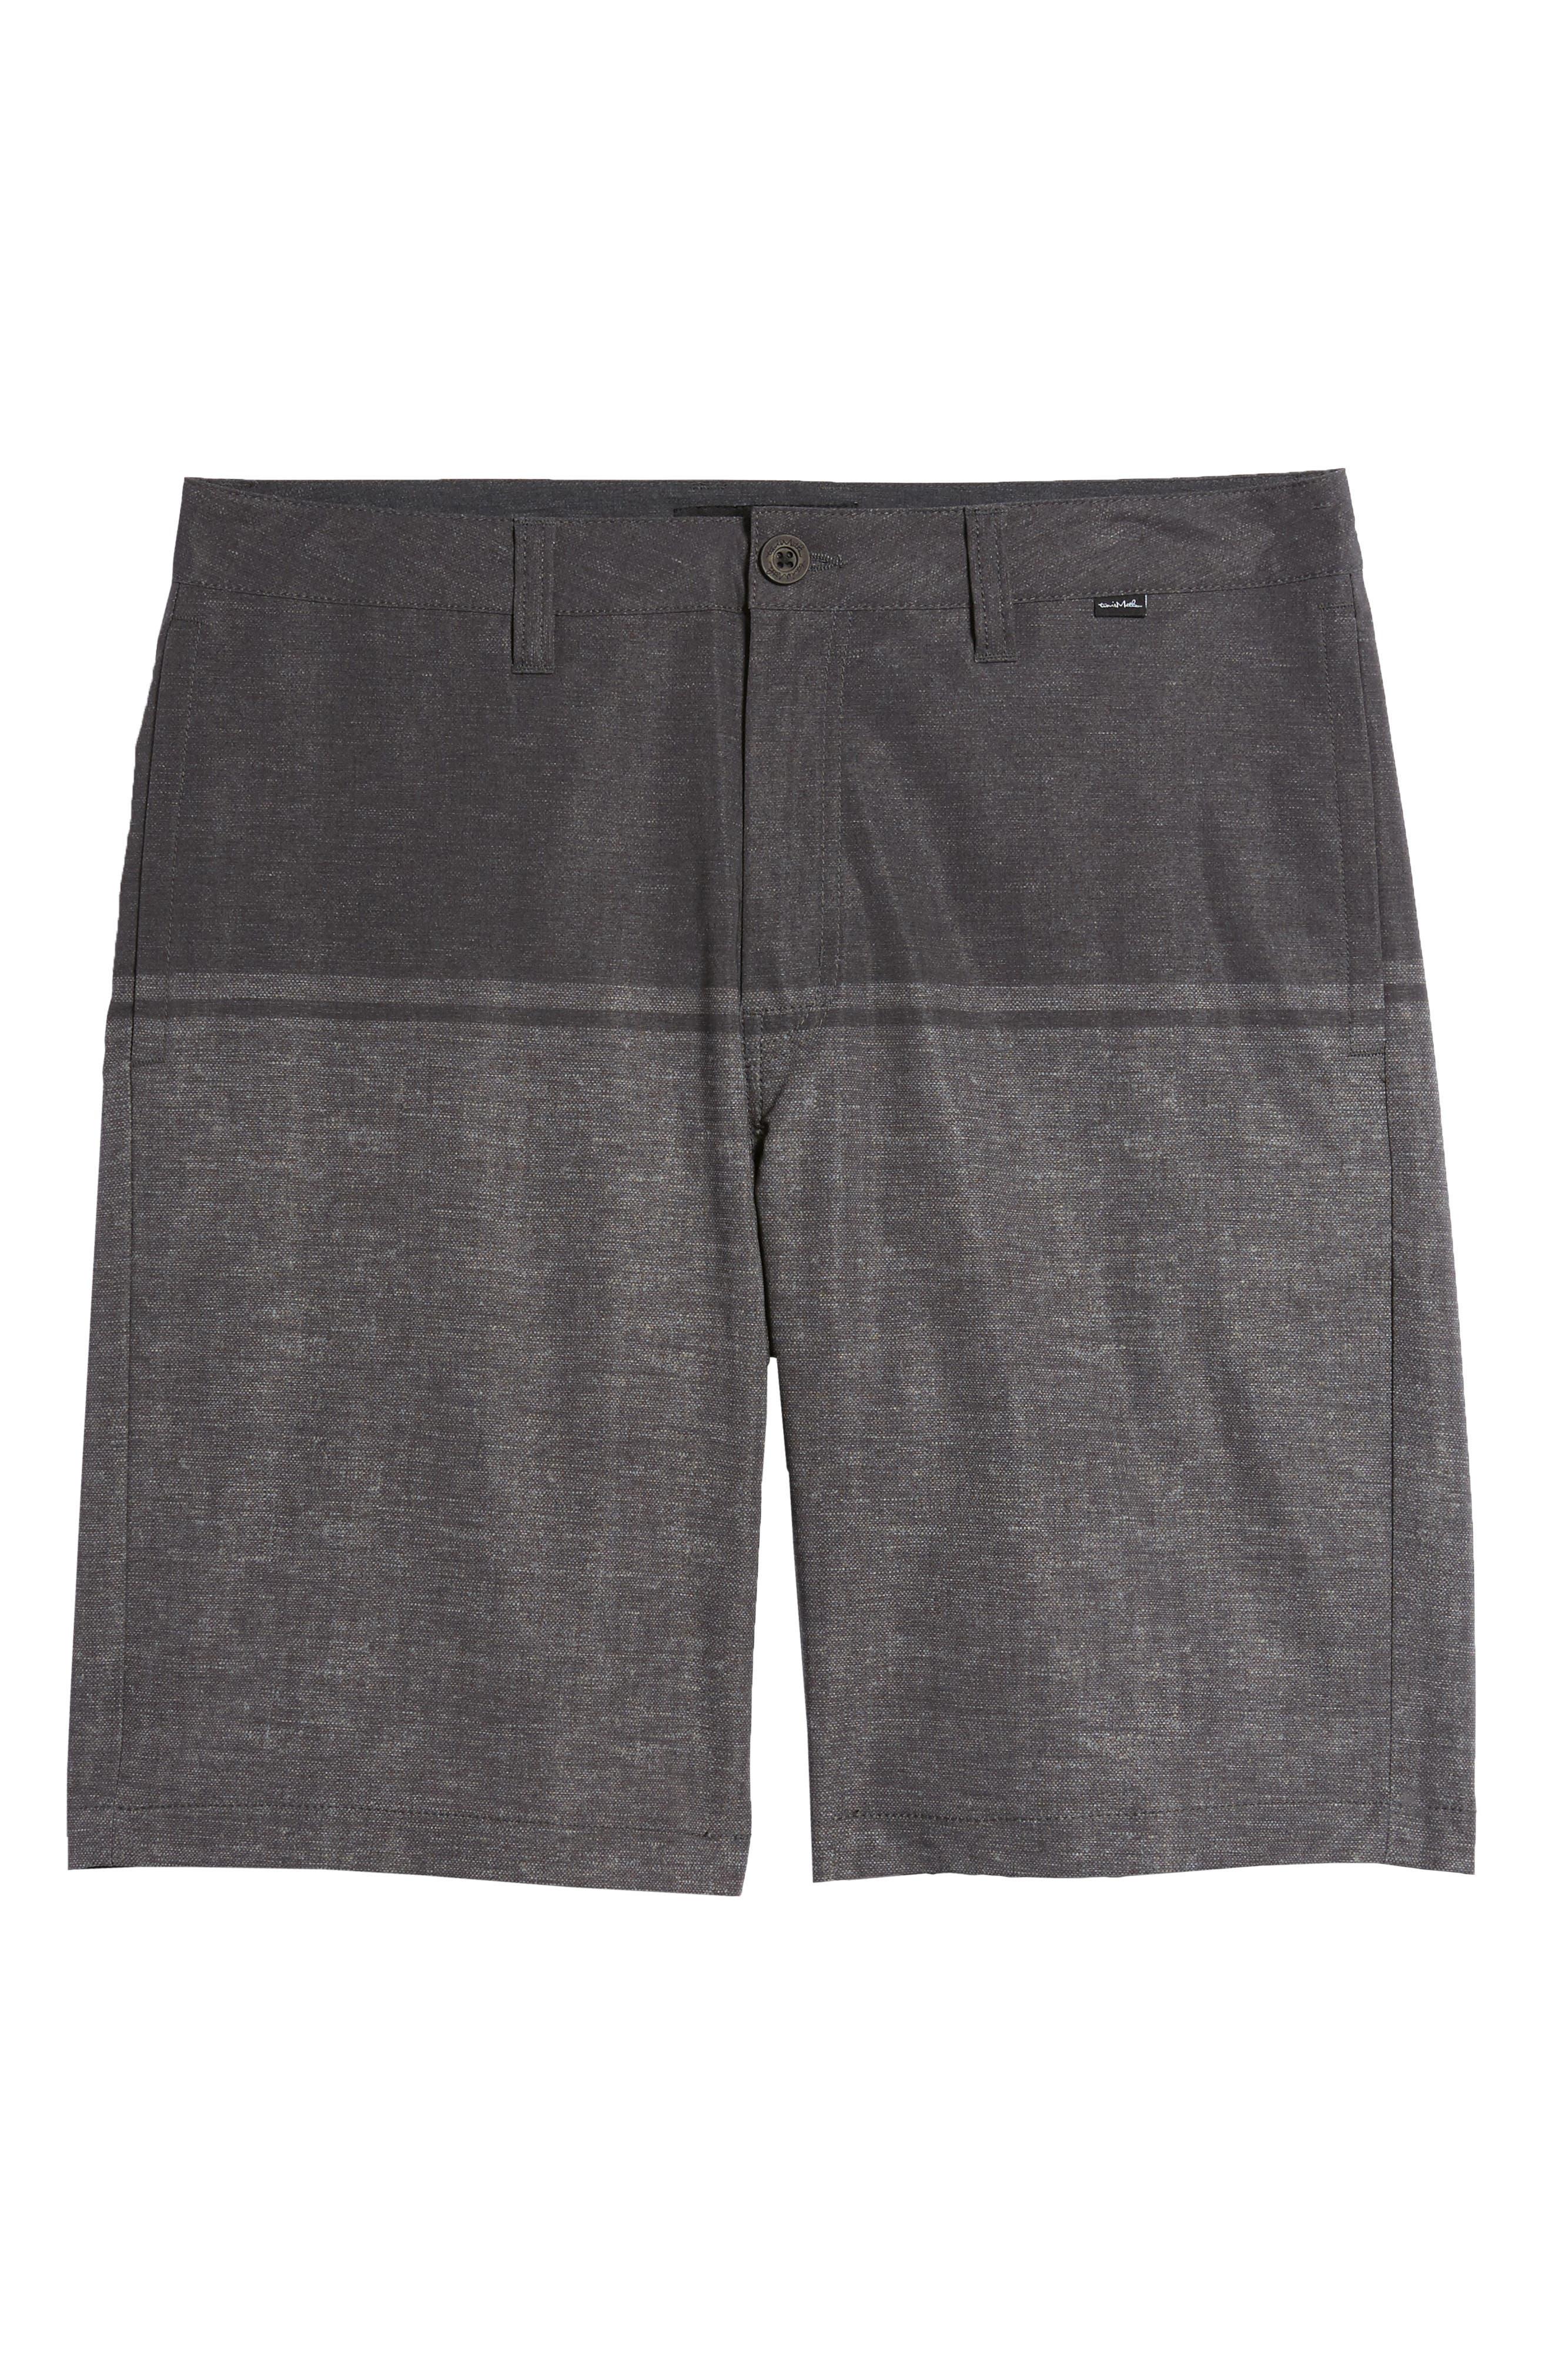 Peale Hybrid Shorts,                             Alternate thumbnail 11, color,